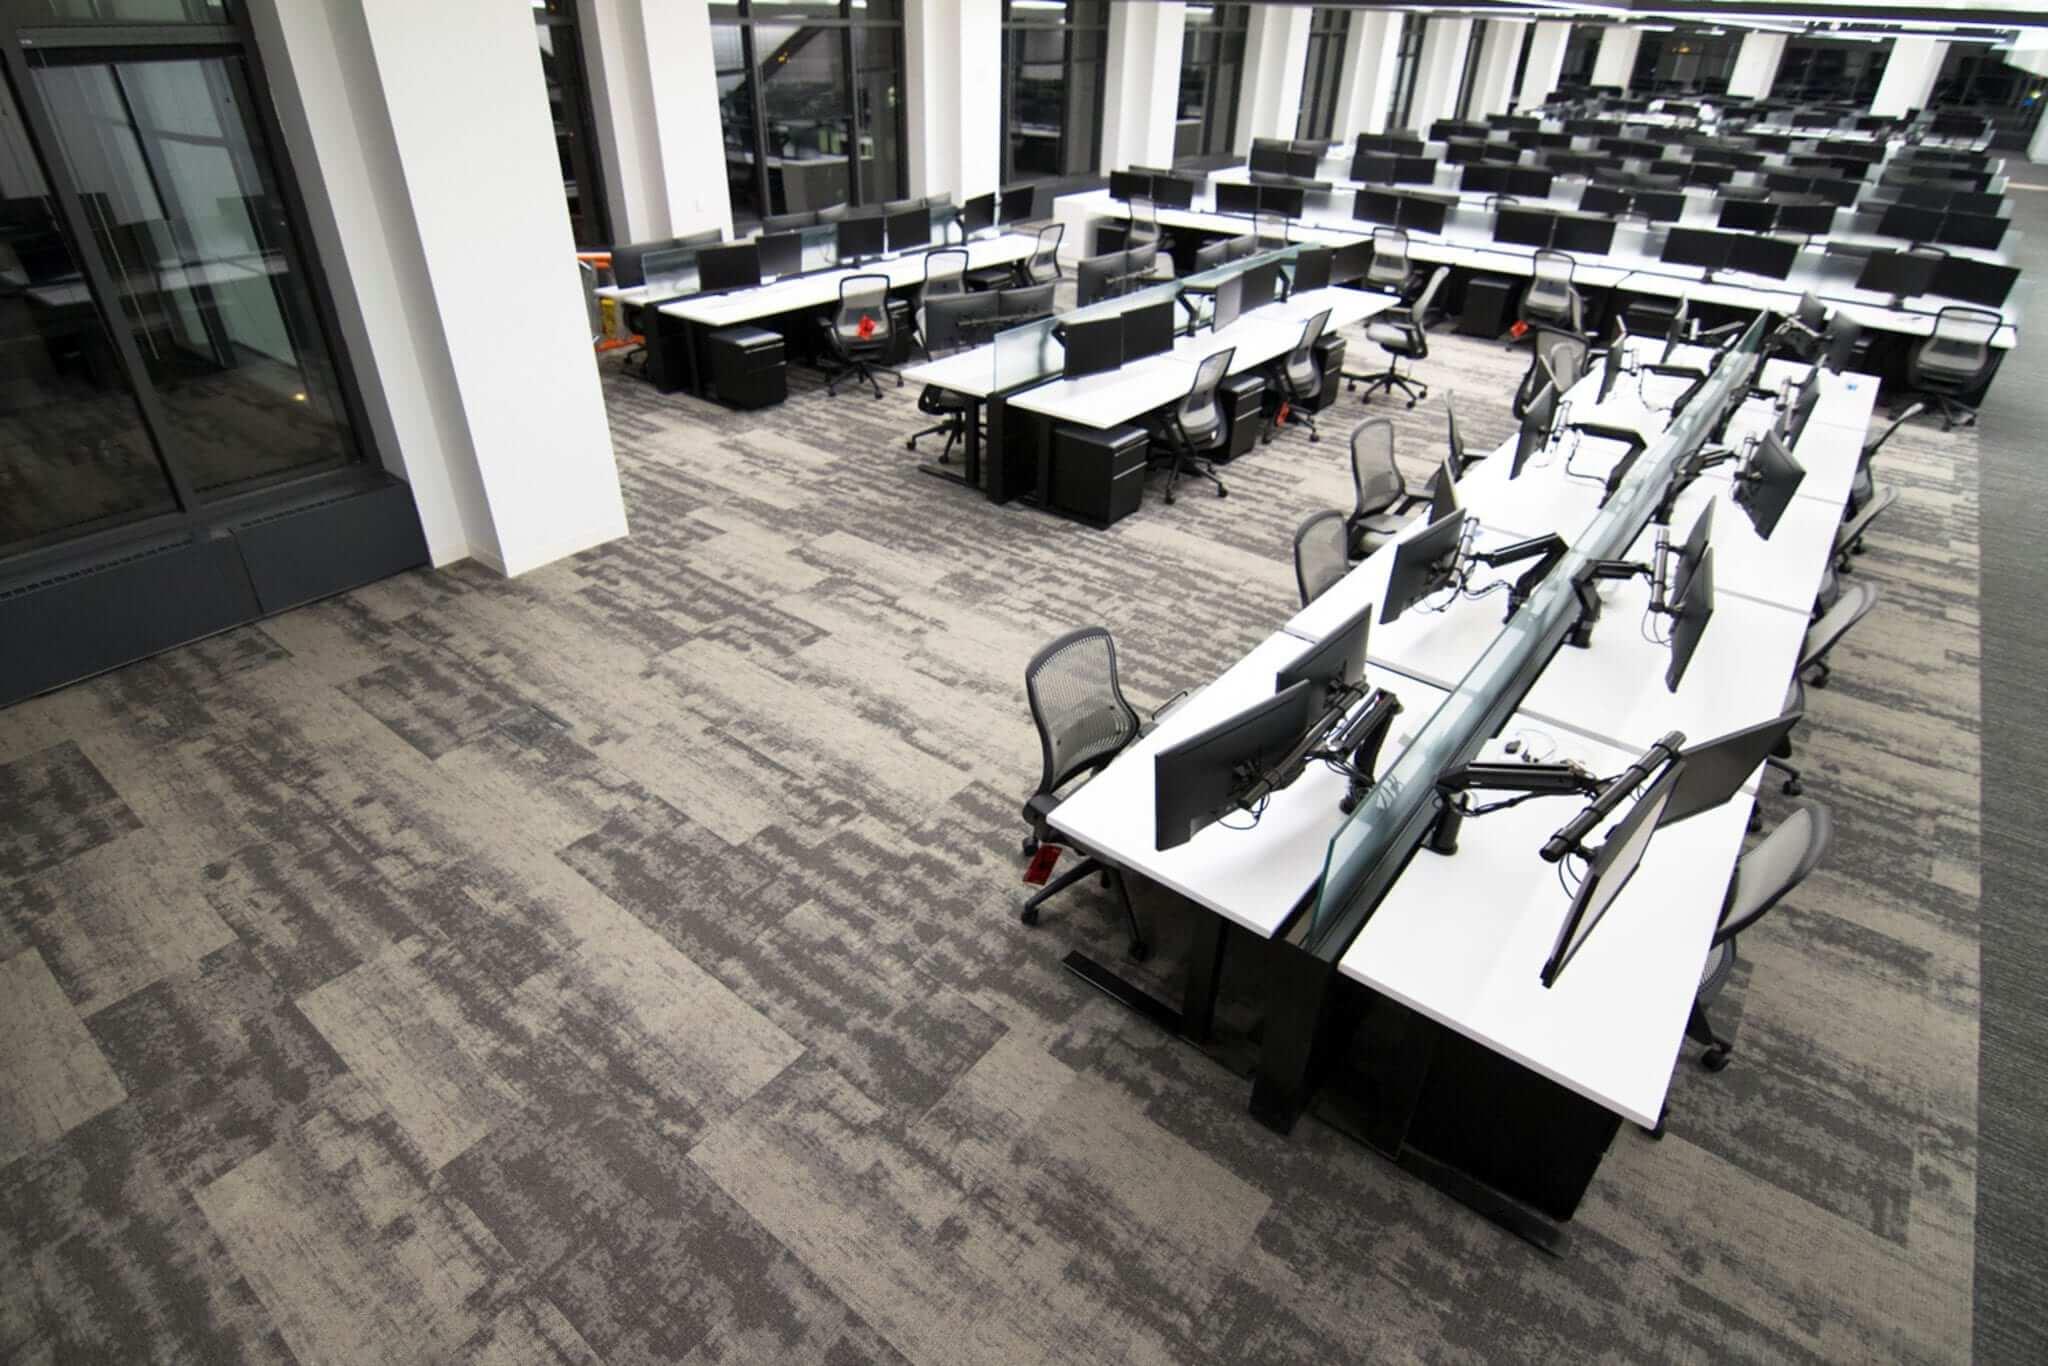 Raised Flooring in Bank Of America Trading Room